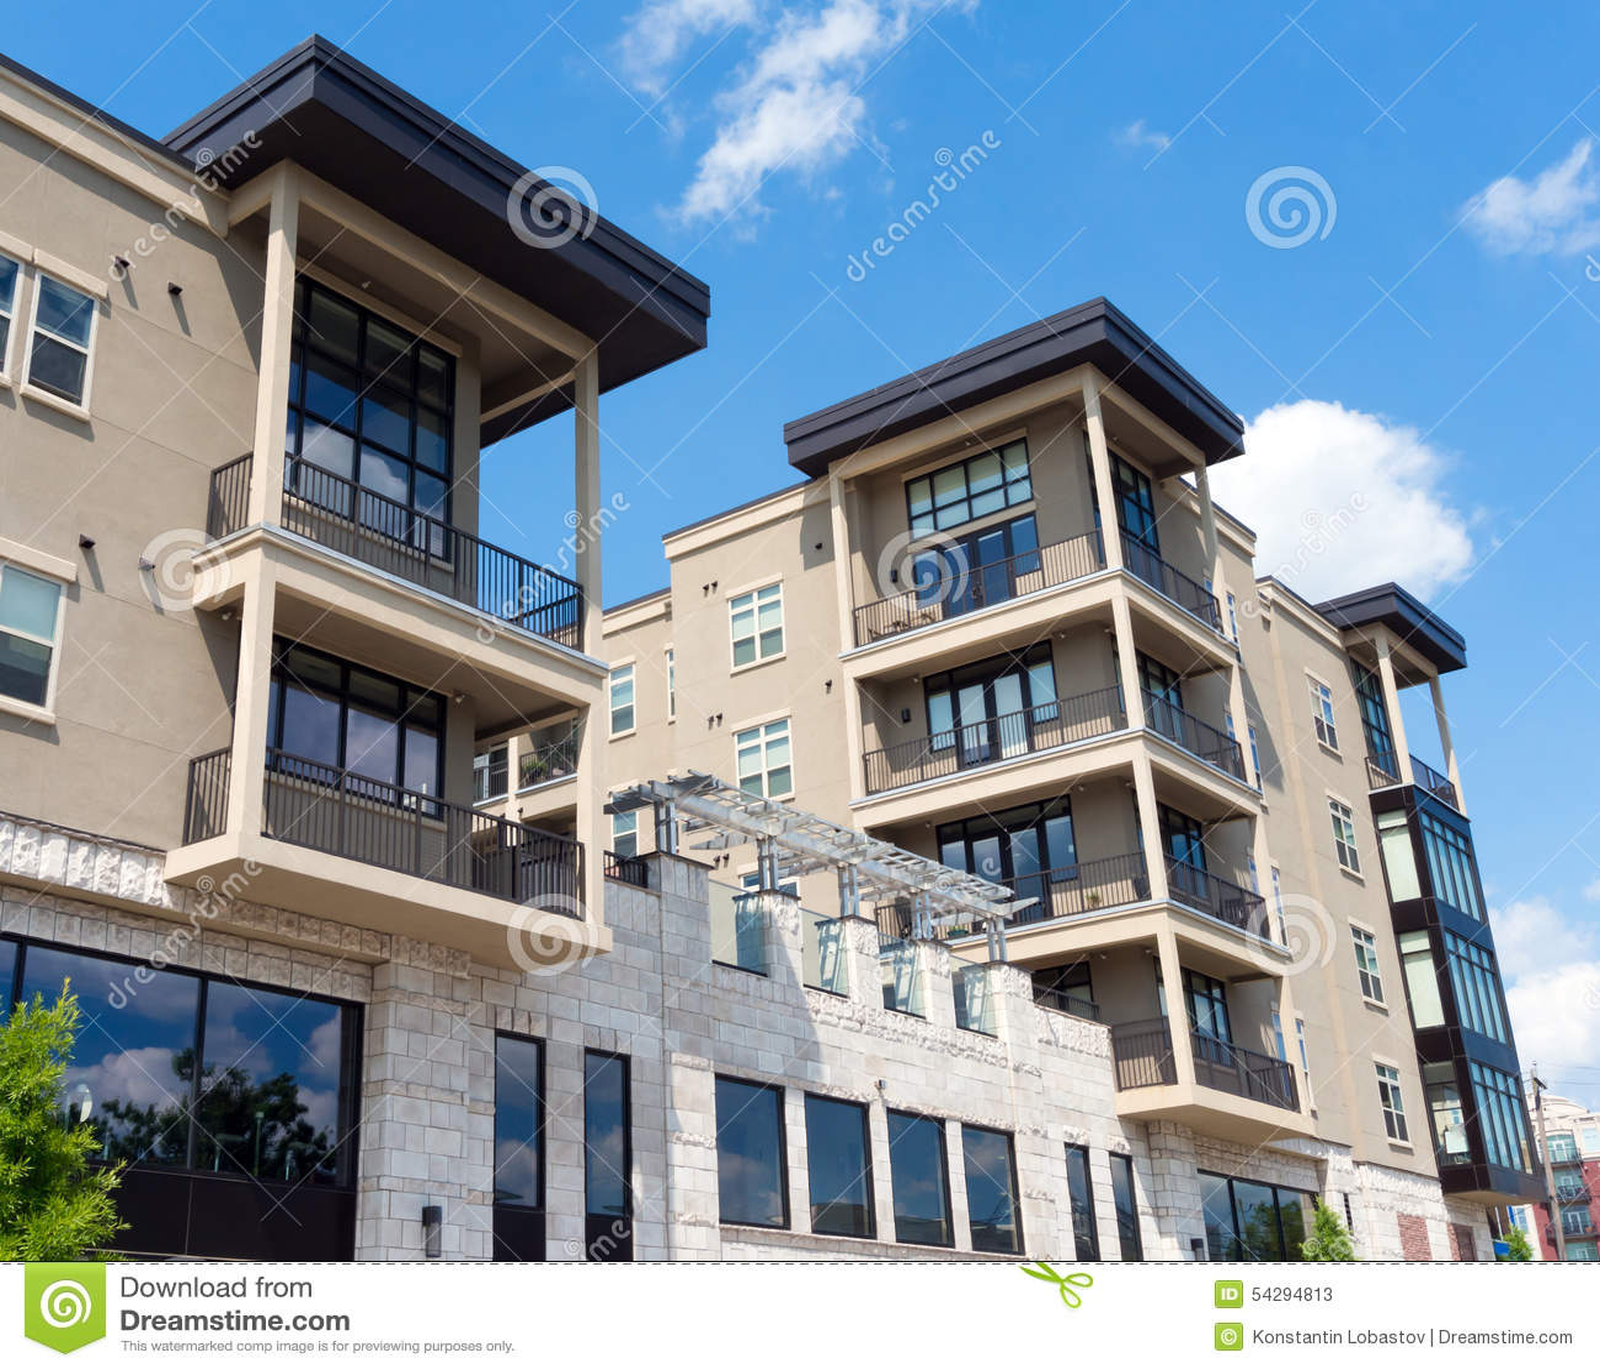 Apartment Building Exterior Mixed Modern